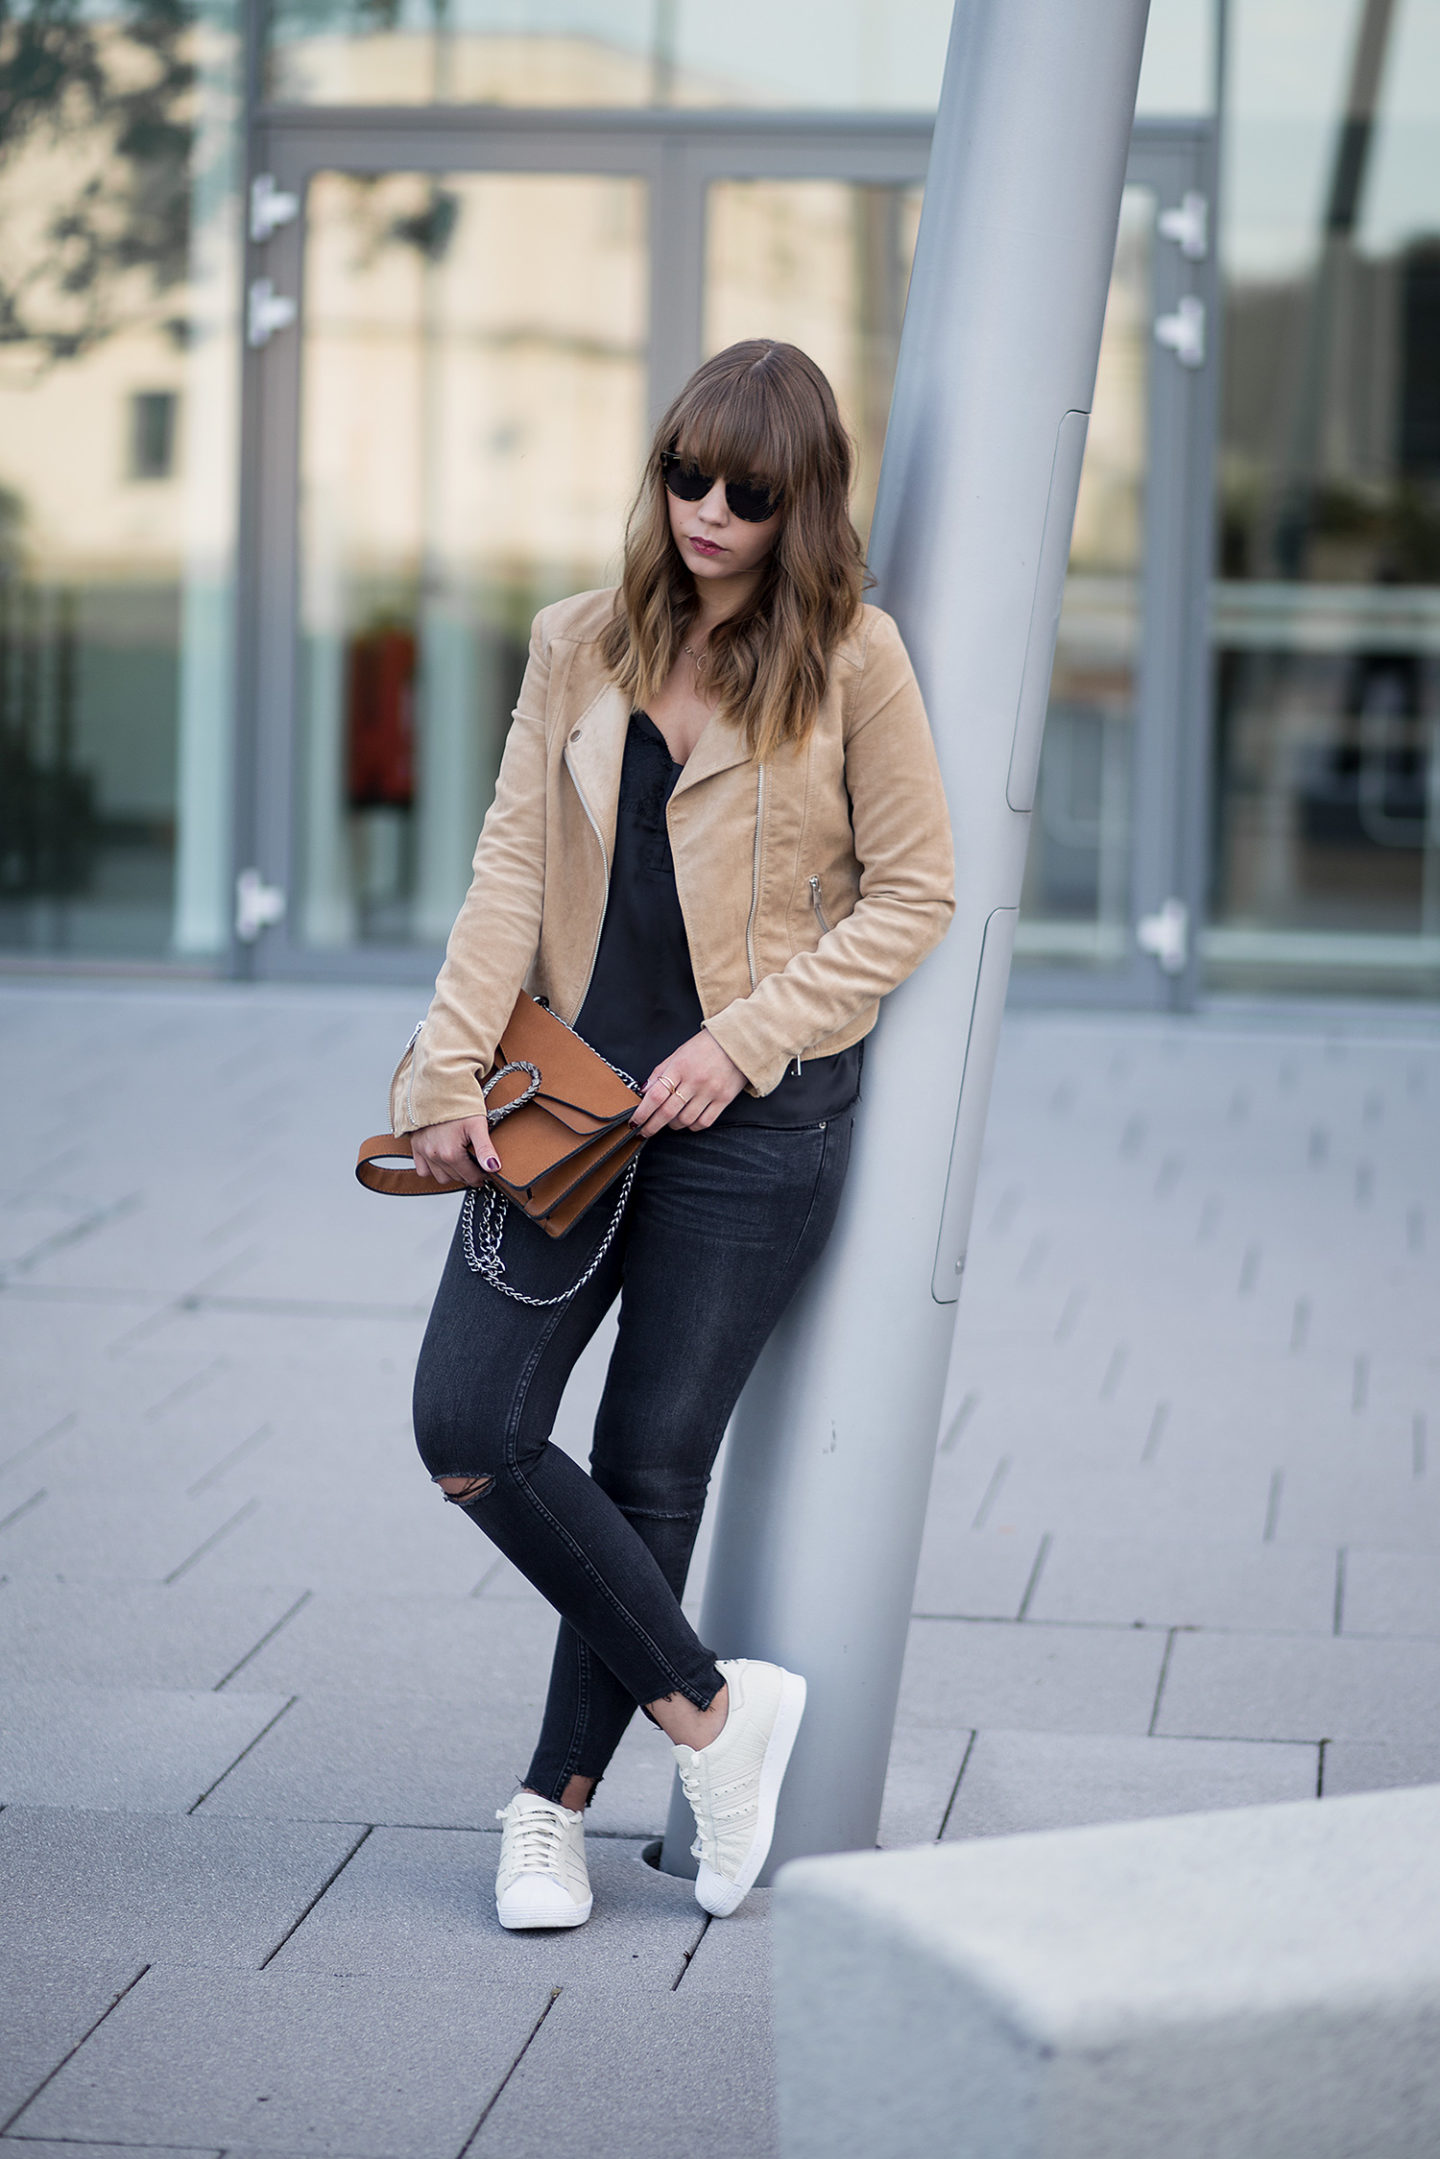 schwarz-und-braun-kombinieren-outfit-lingerie-top-wildlederjacke-adidas-superstars-gucci-dionysus-lookalike-streetstyle-bezauberndenana-2